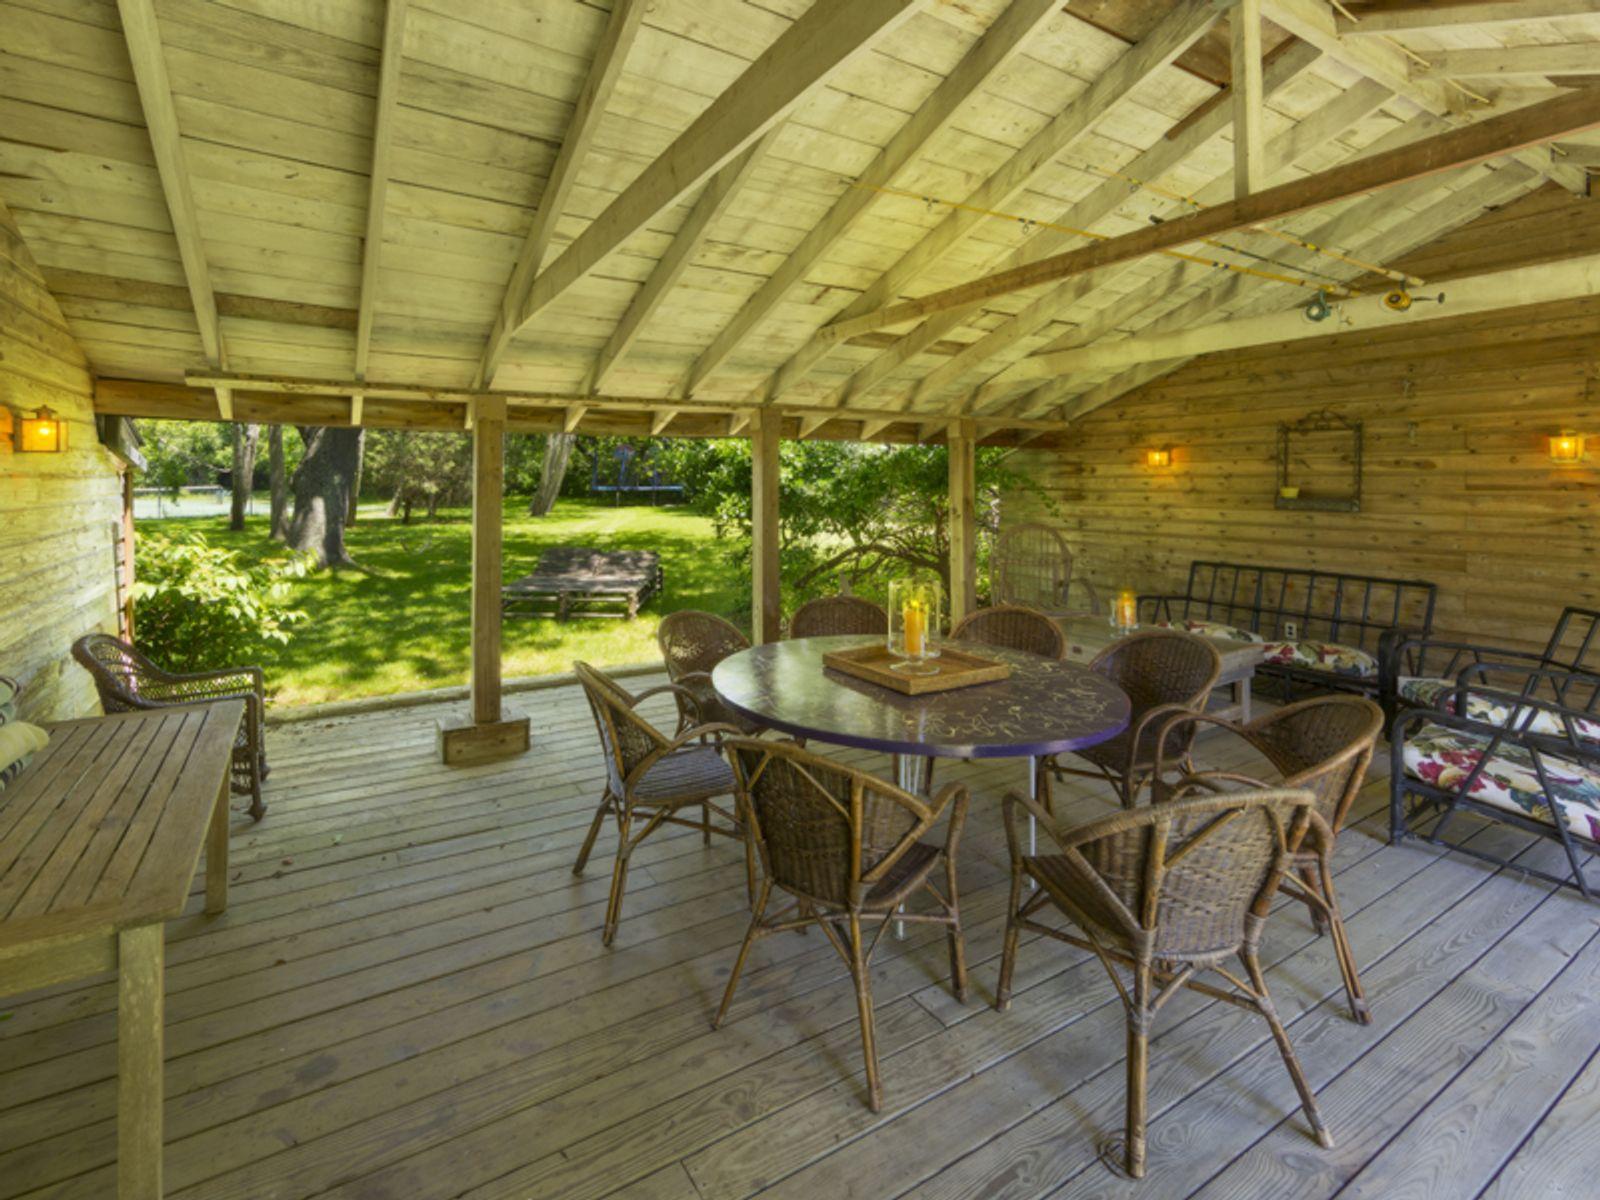 Green Top Farm: An Idyllic Retreat